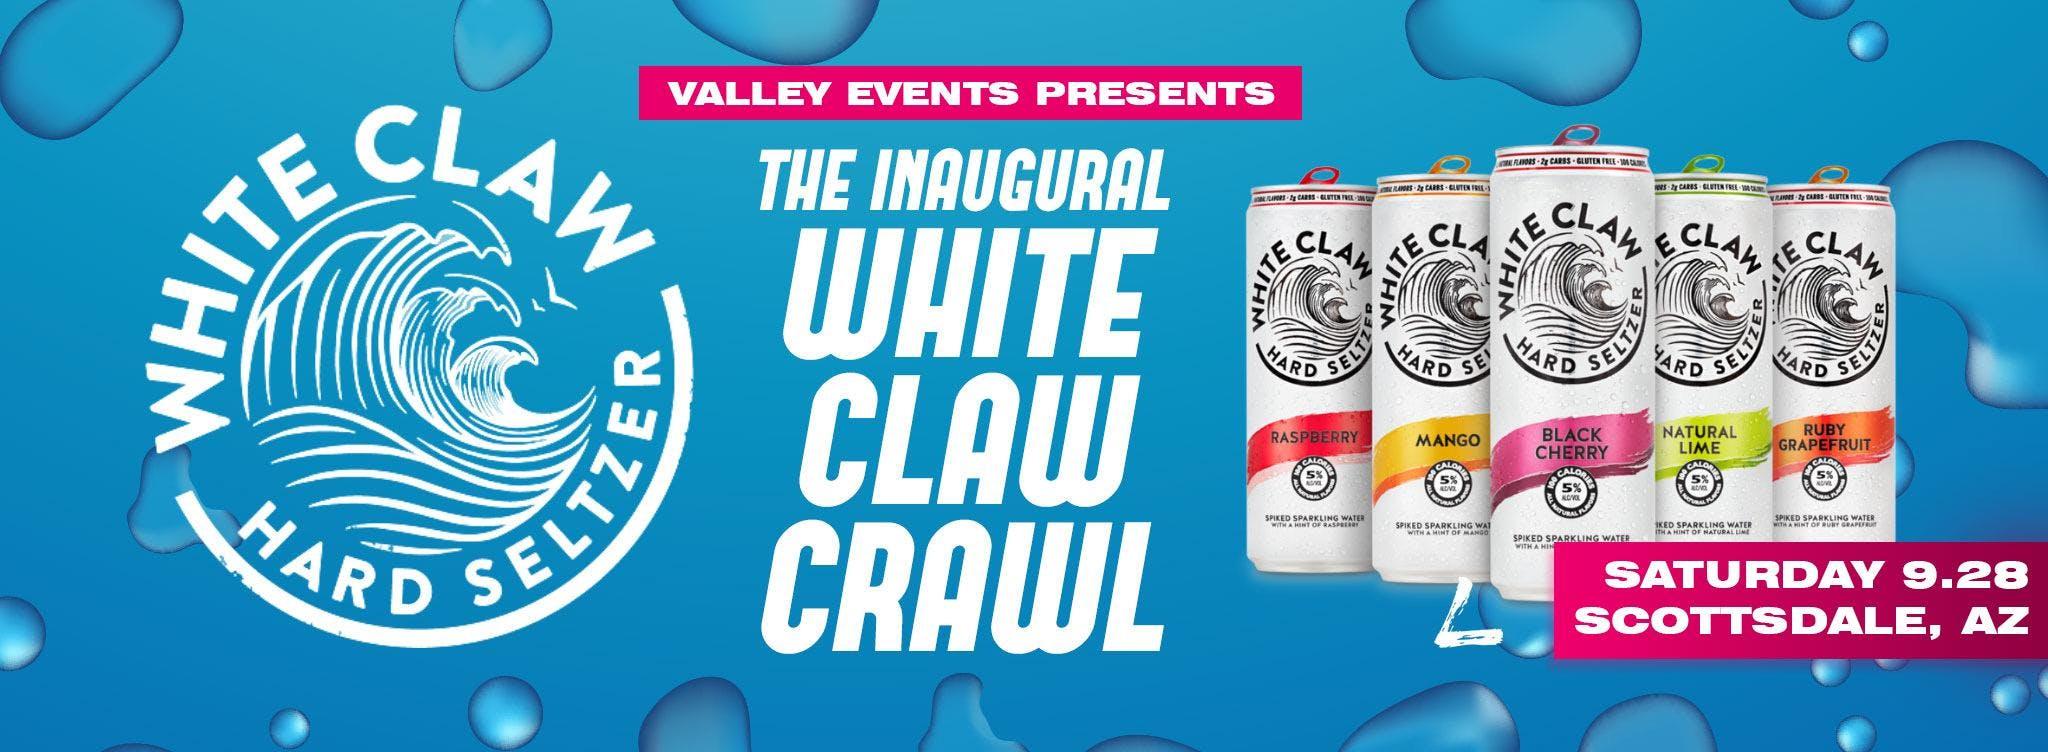 White Claw Crawl *Inaugural* - Scottsdale, AZ - Sept 28th